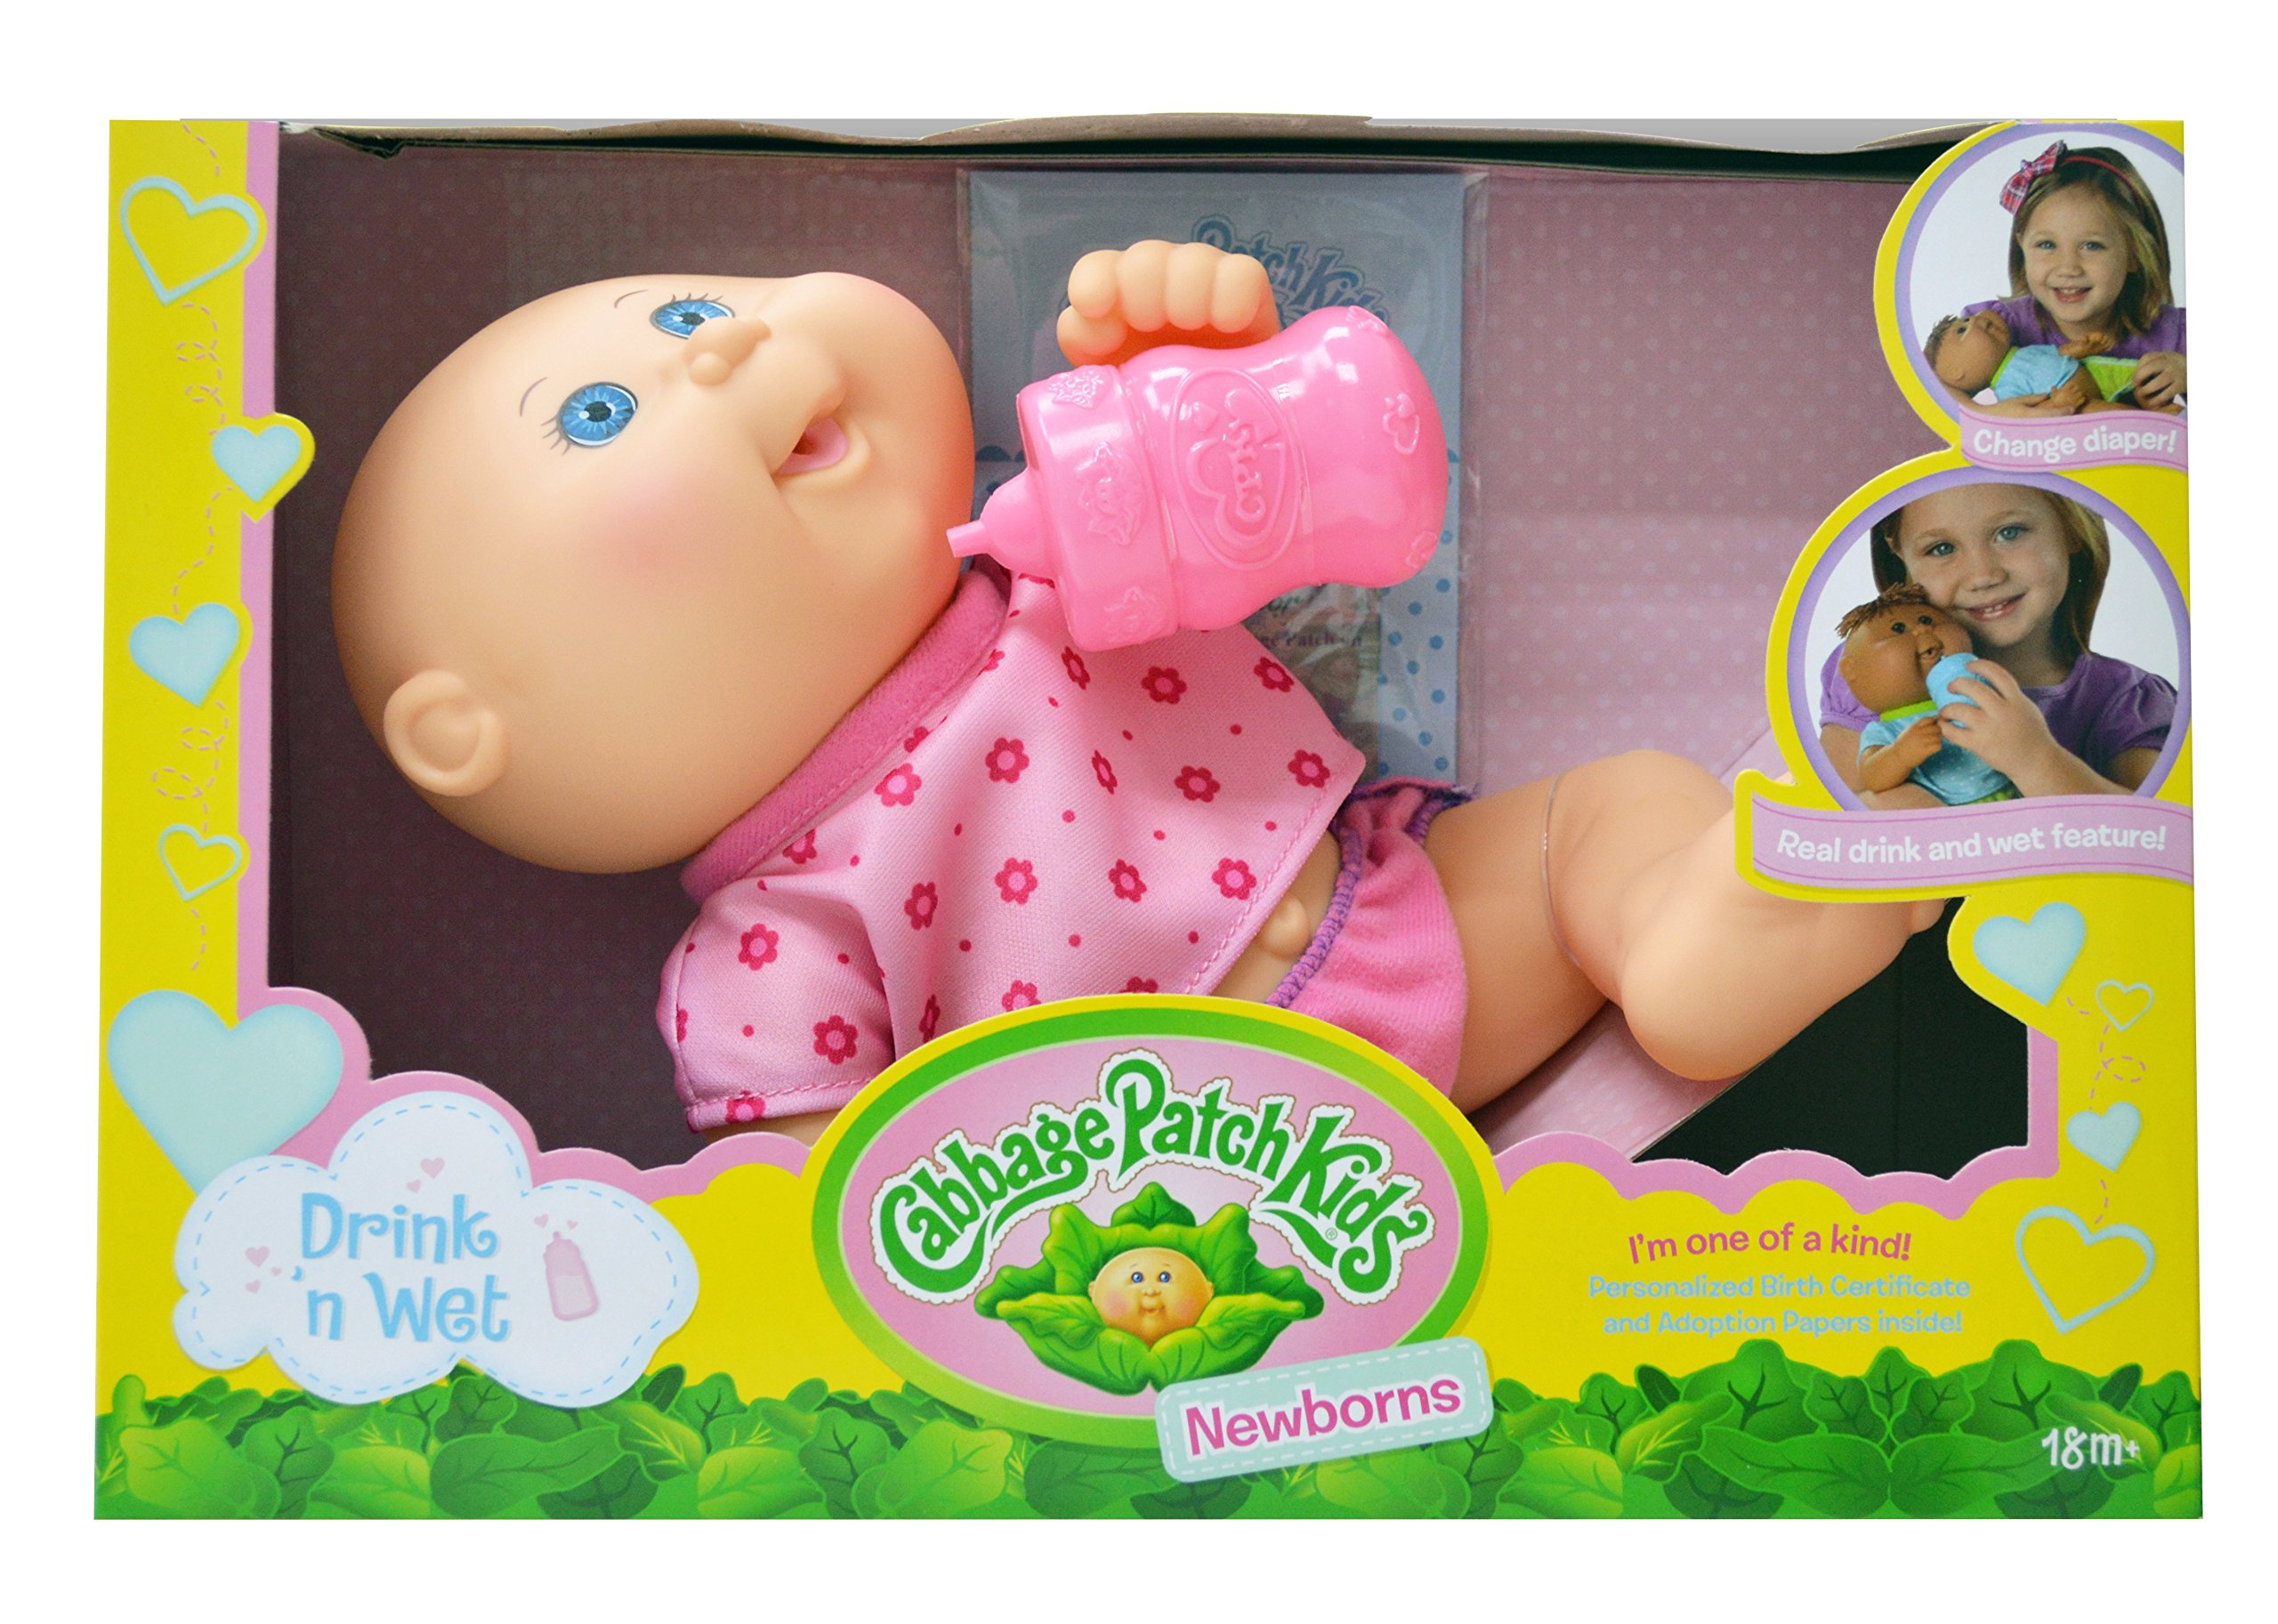 Cabbage Patch Kids, Drink N' Wet Newborn Baby Doll - Baby Girl in Pink Flower Fashion